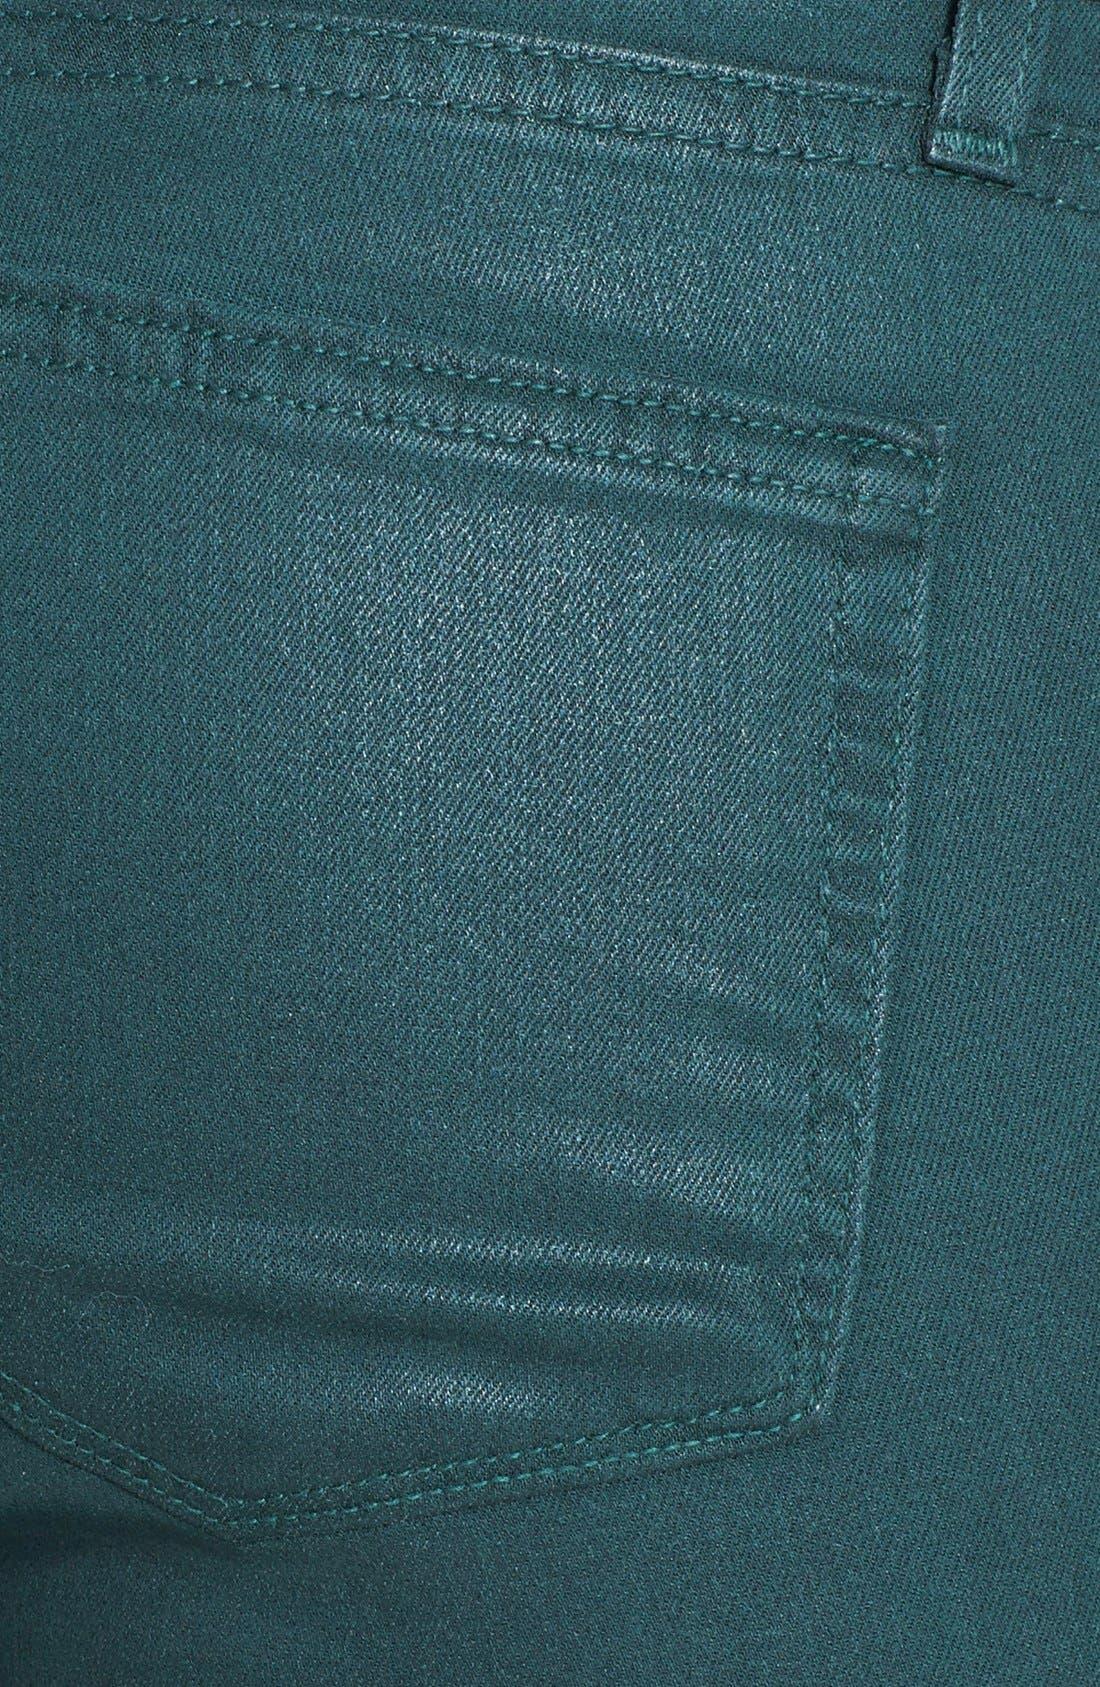 Alternate Image 3  - Paige Denim 'Verdugo' Coated Ultra Skinny Ankle Jeans (Forest Silk)